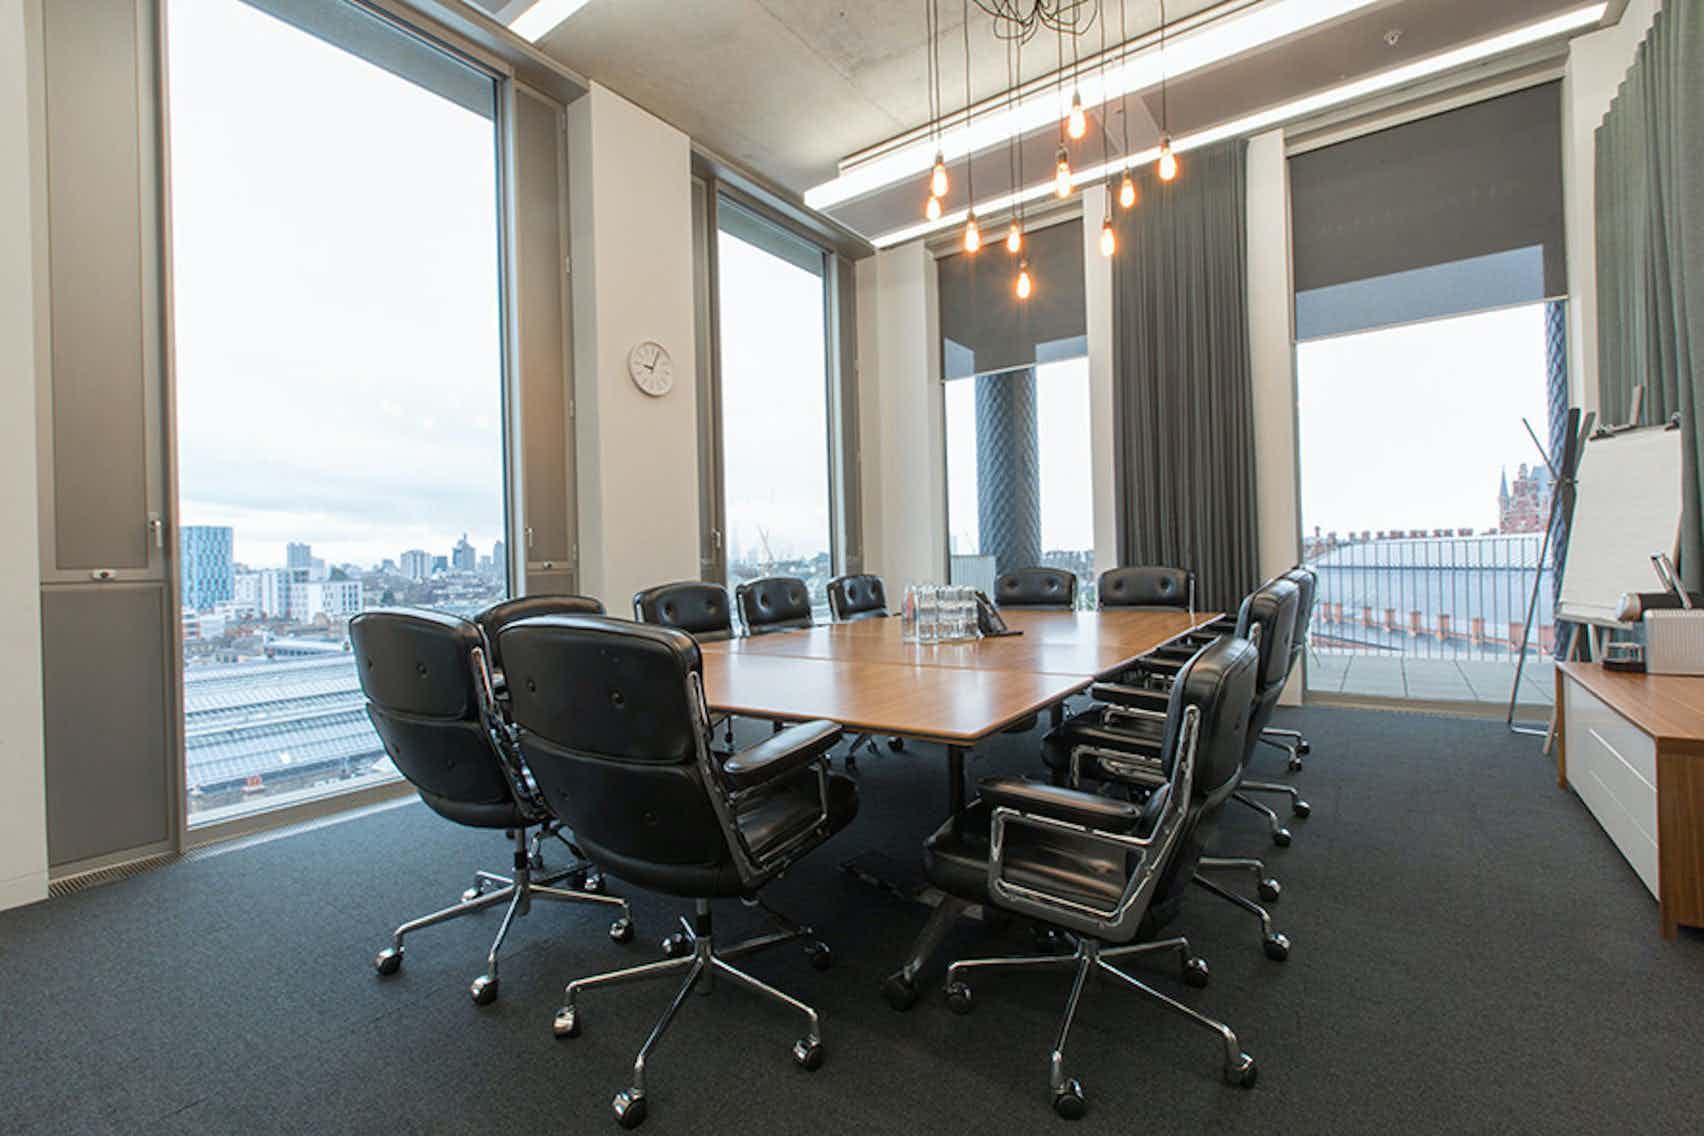 Meeting Room 8, TOG, The Gridiron